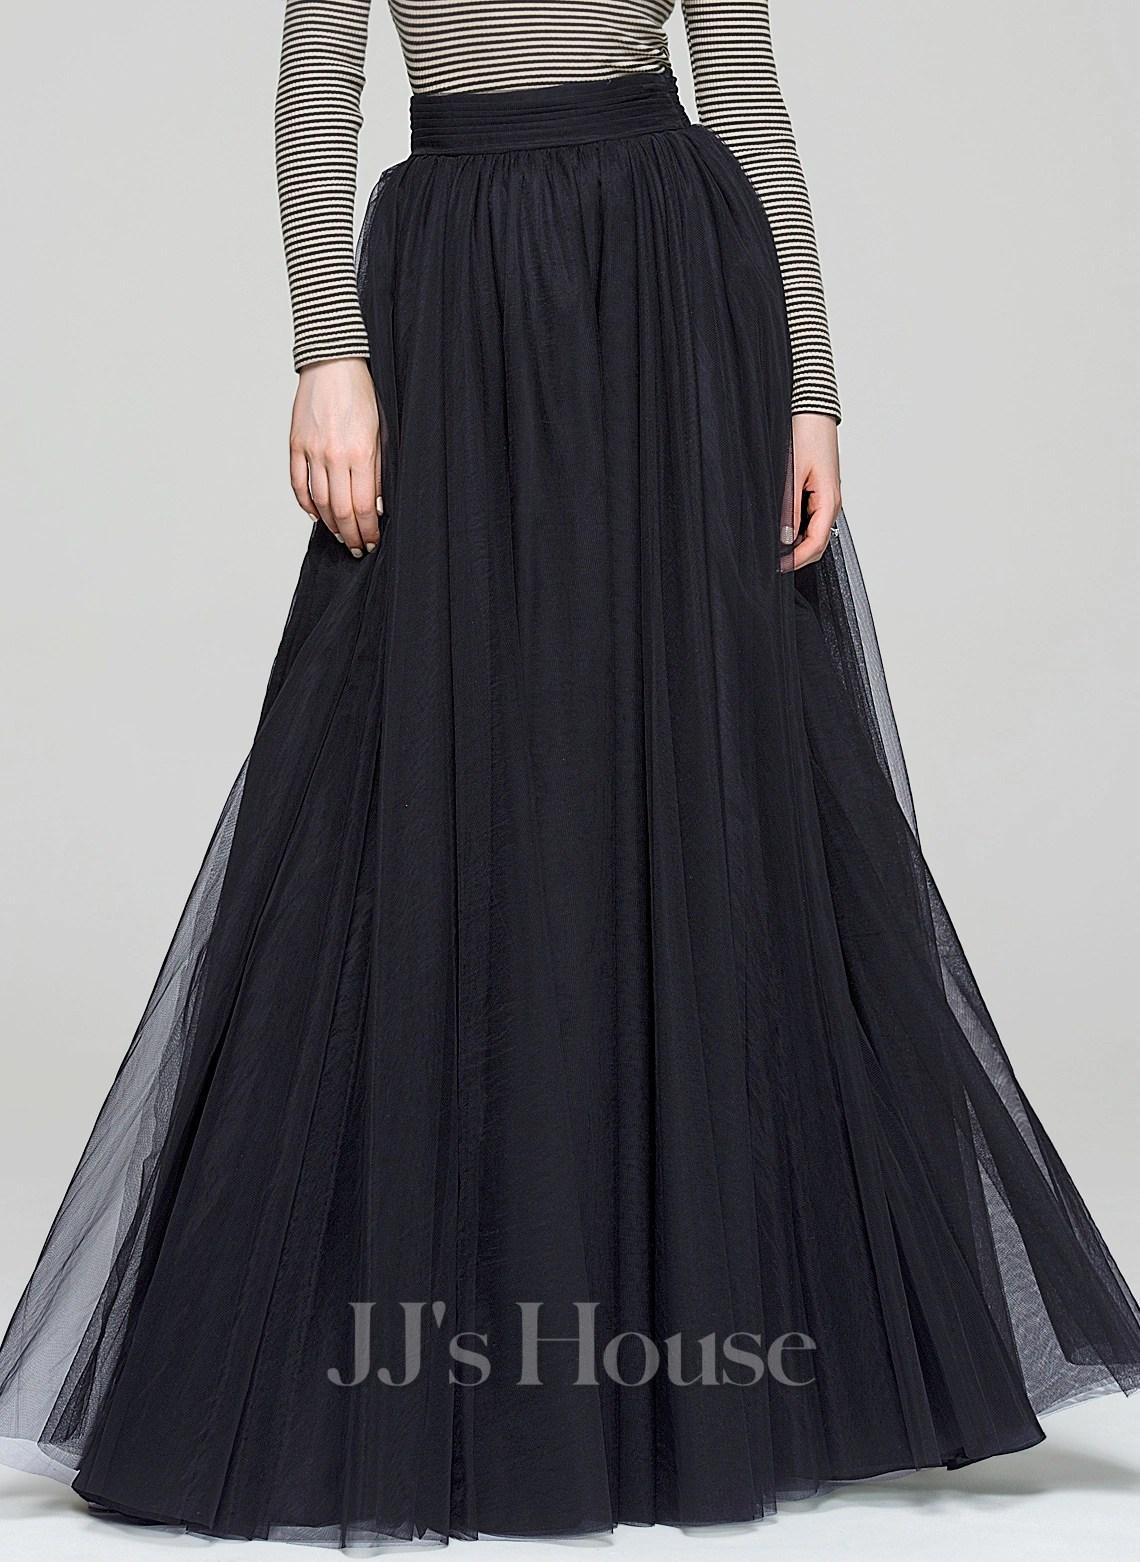 ALinePrincess FloorLength Tulle Cocktail Skirt